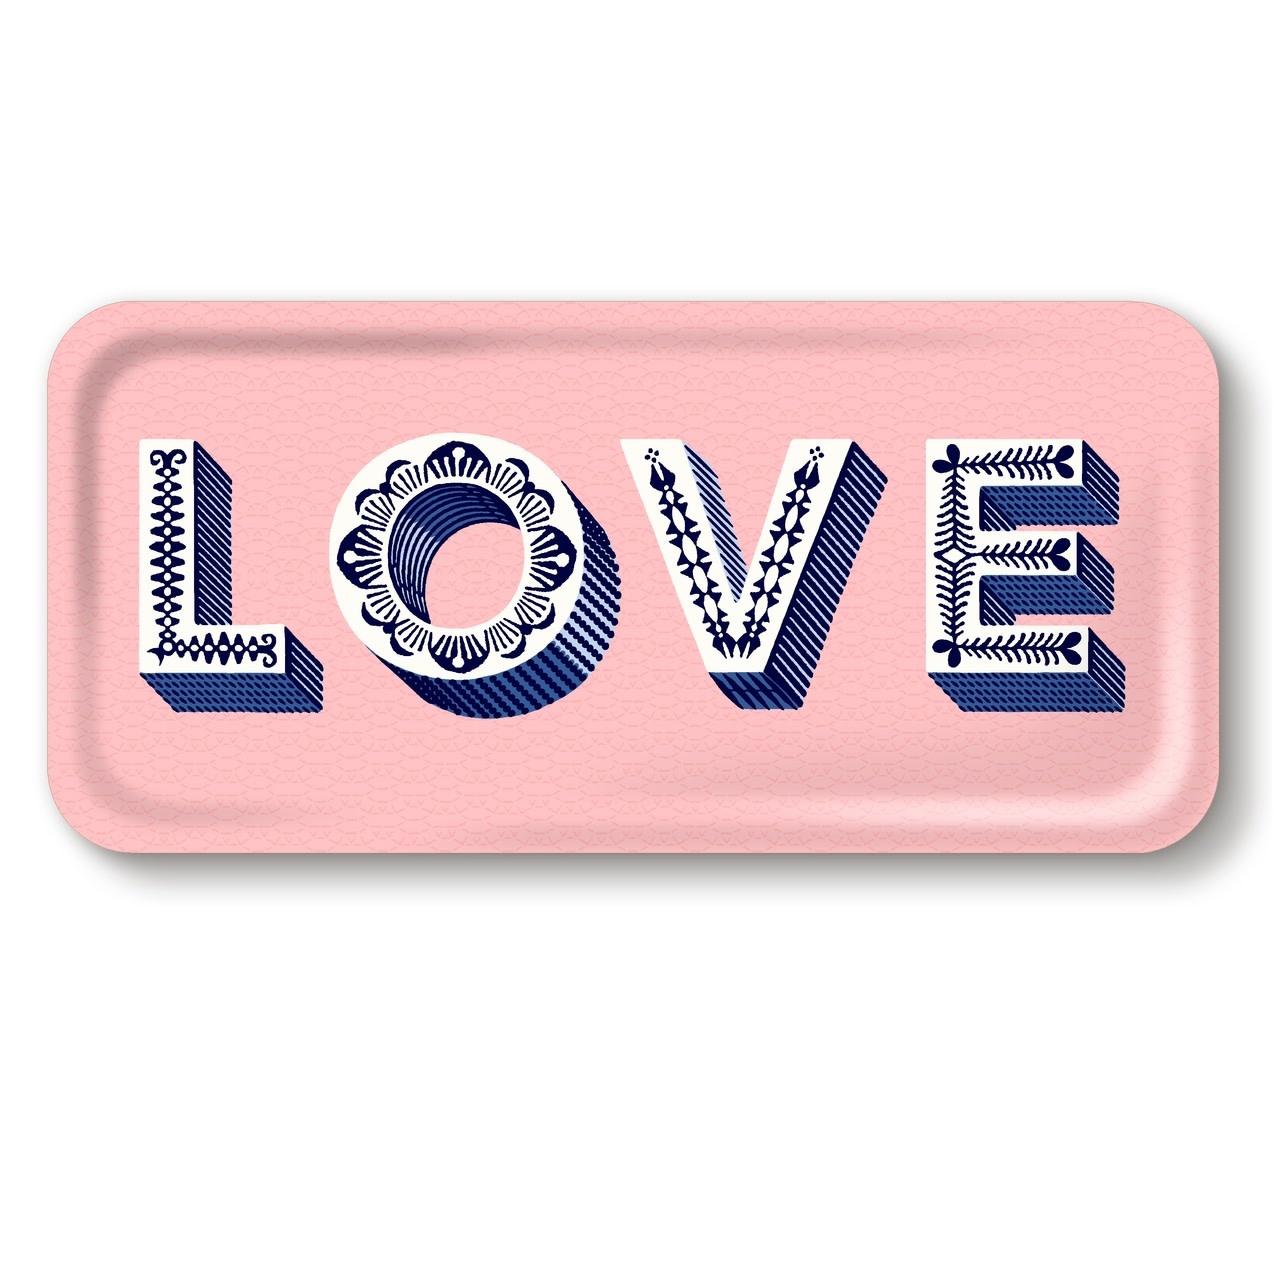 M24 TRAY LOVE, PINK-1